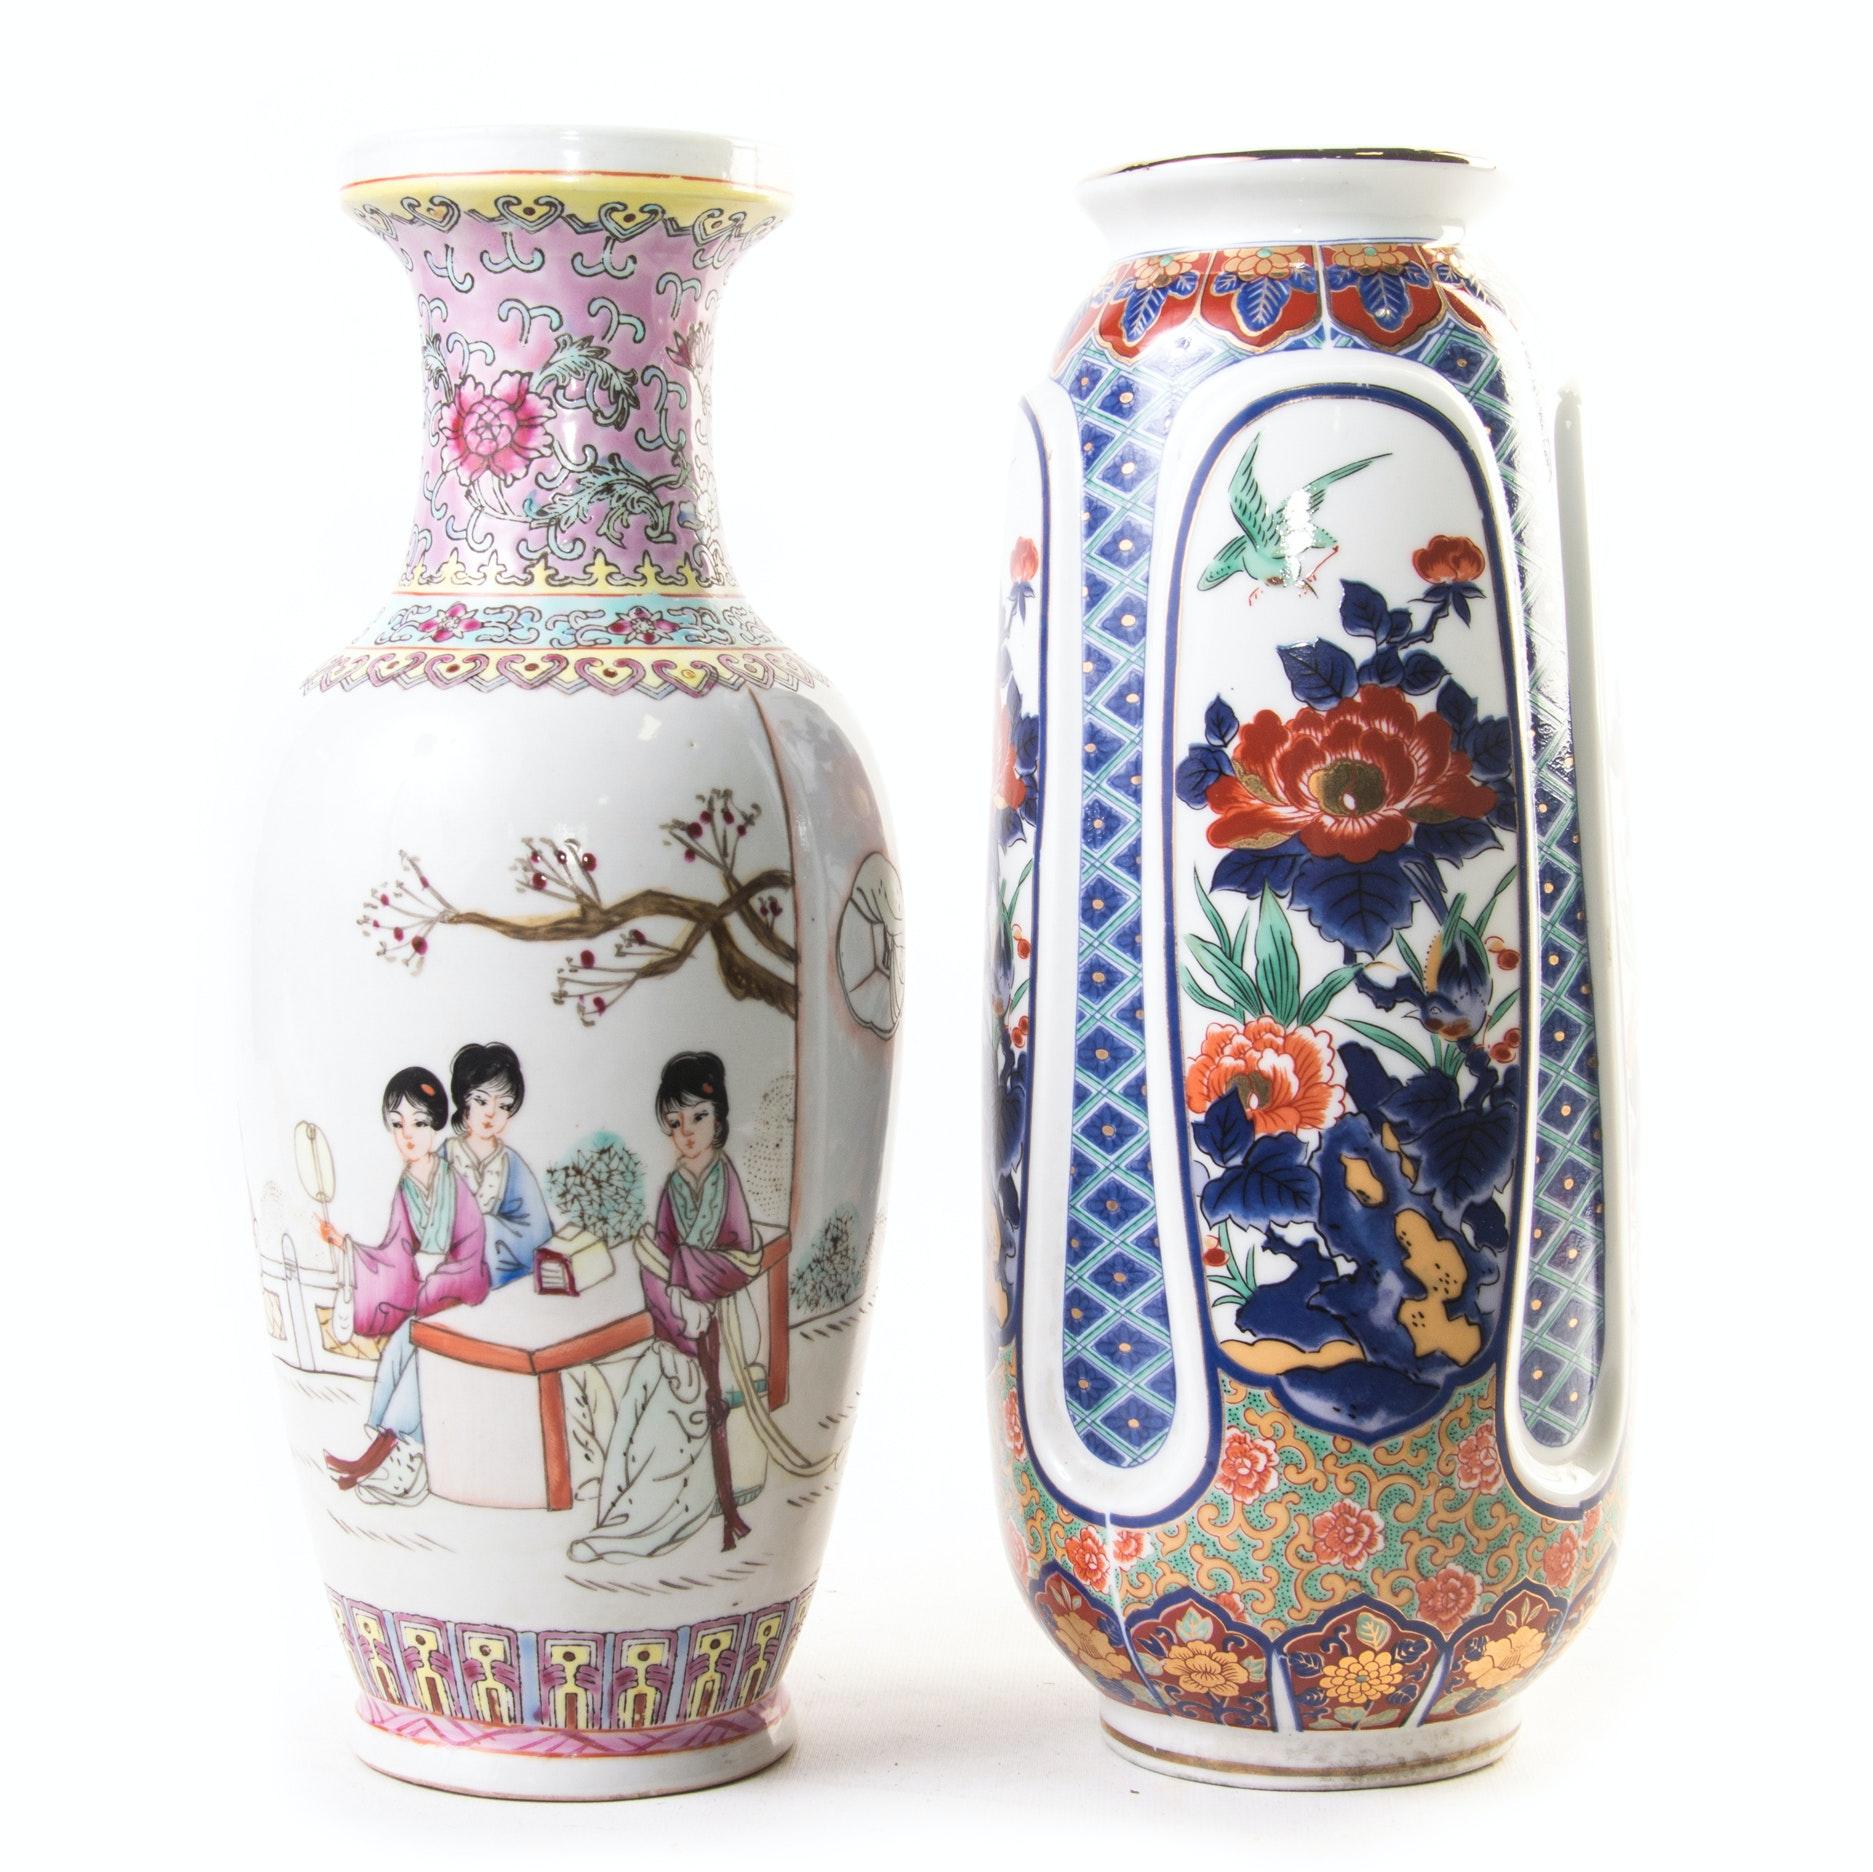 Chinese and Japanese Ceramic Vases